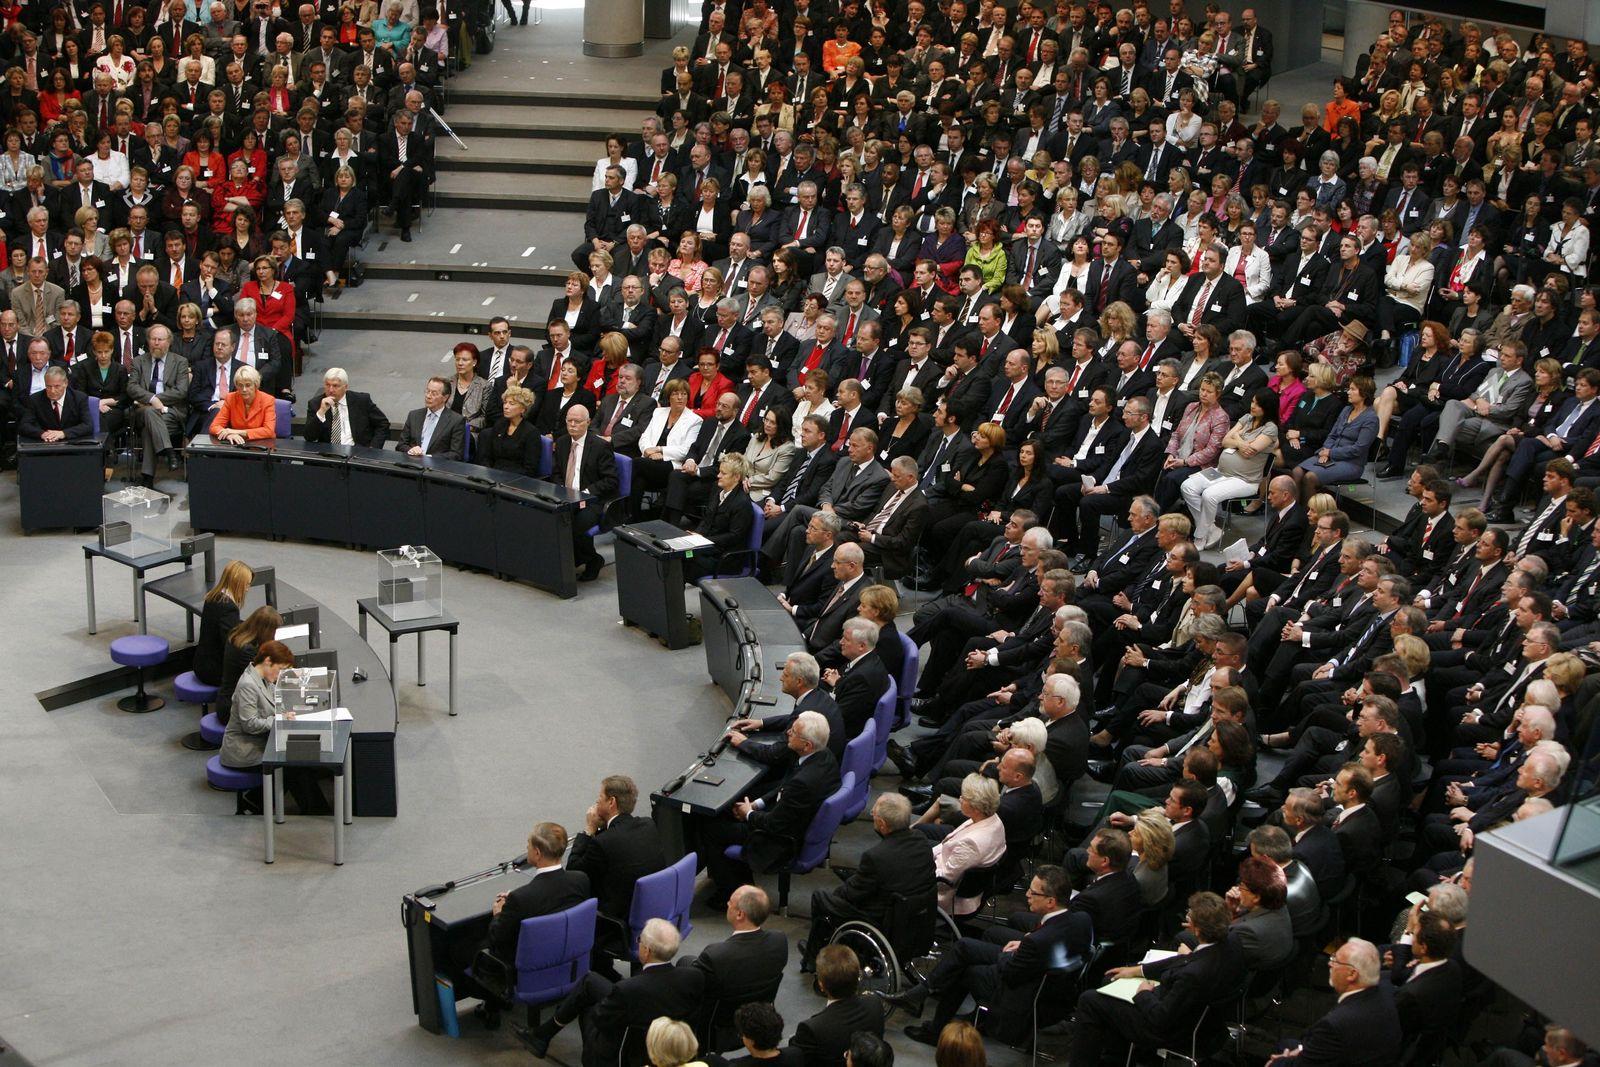 Bundespräsident / Wahl / Bundesversammlung 2009